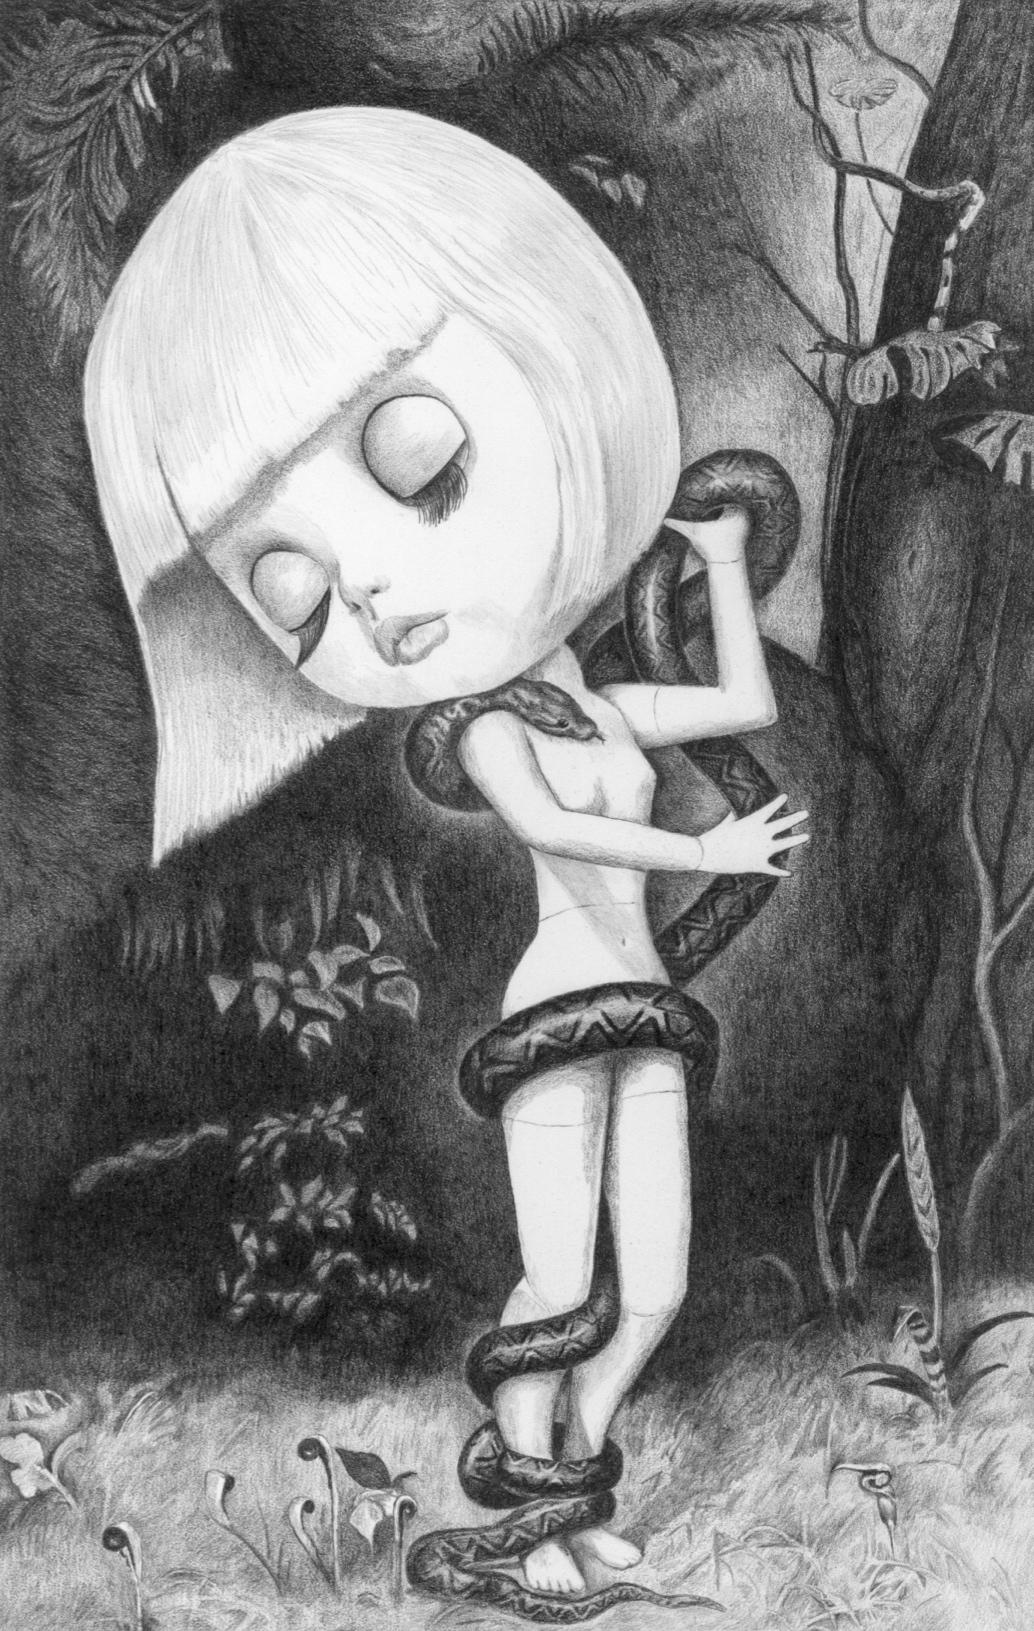 #19 - Blythe Lilith